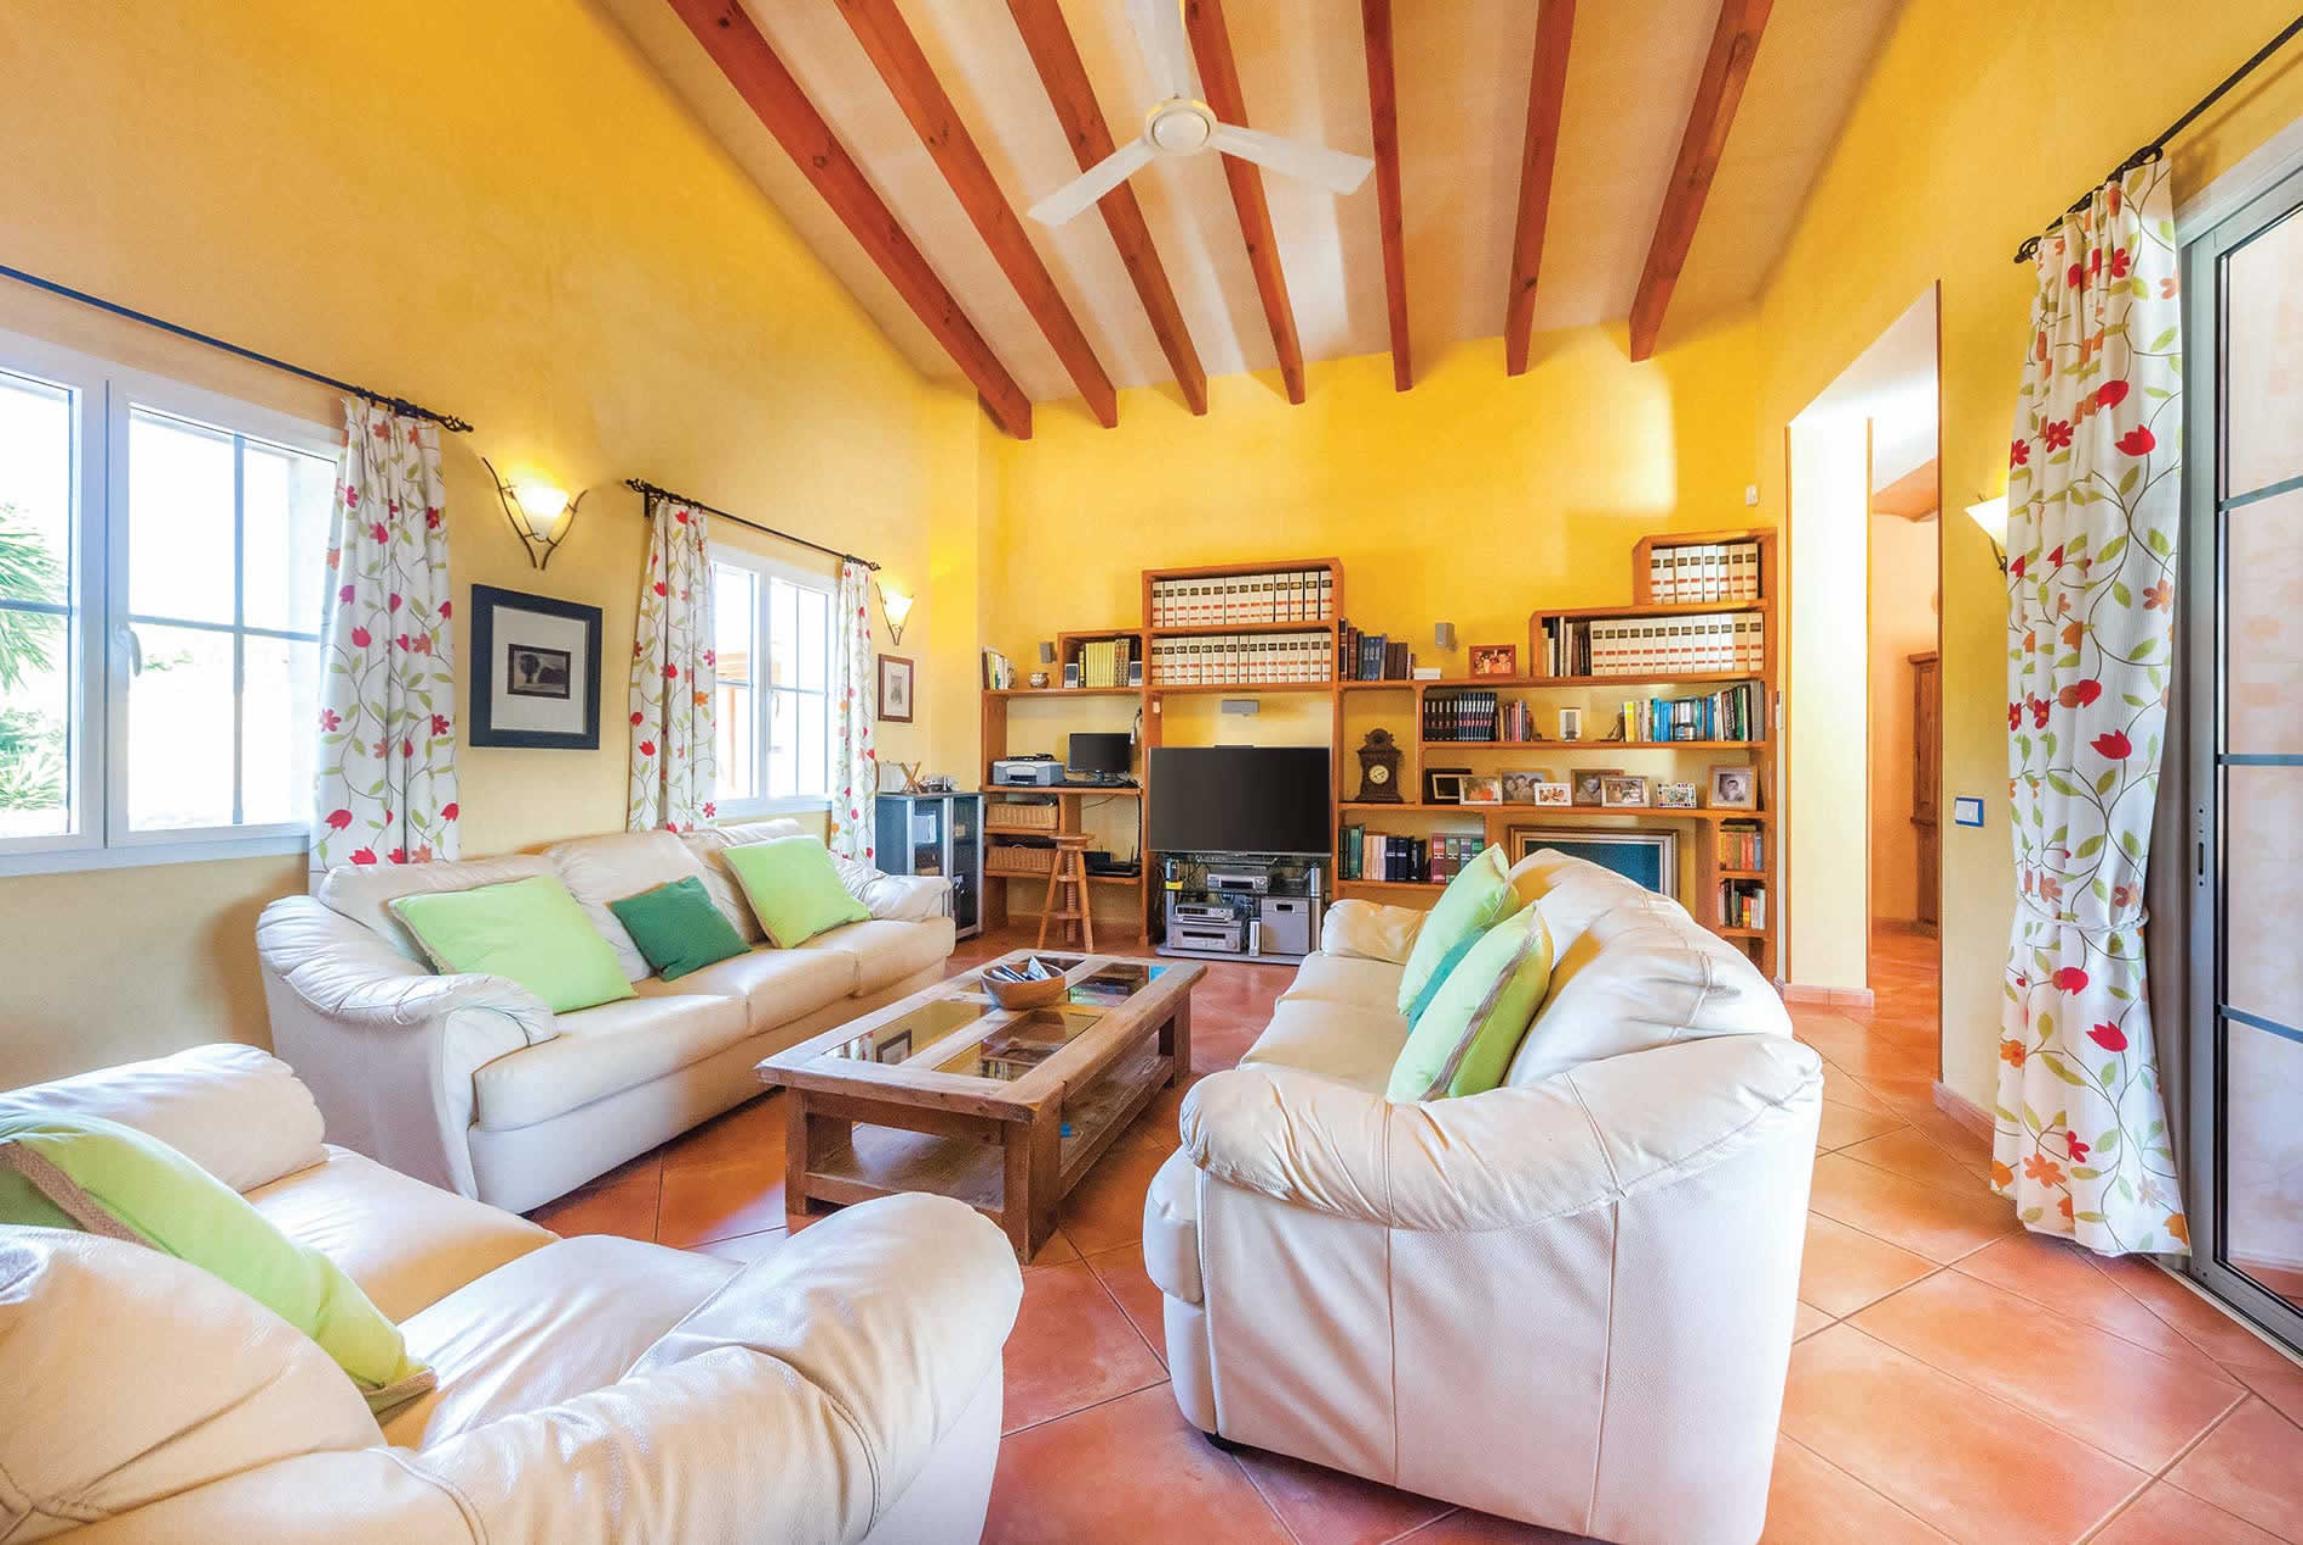 Ferienhaus Villa Estrellita (2649653), Punta Prima, Menorca, Balearische Inseln, Spanien, Bild 2